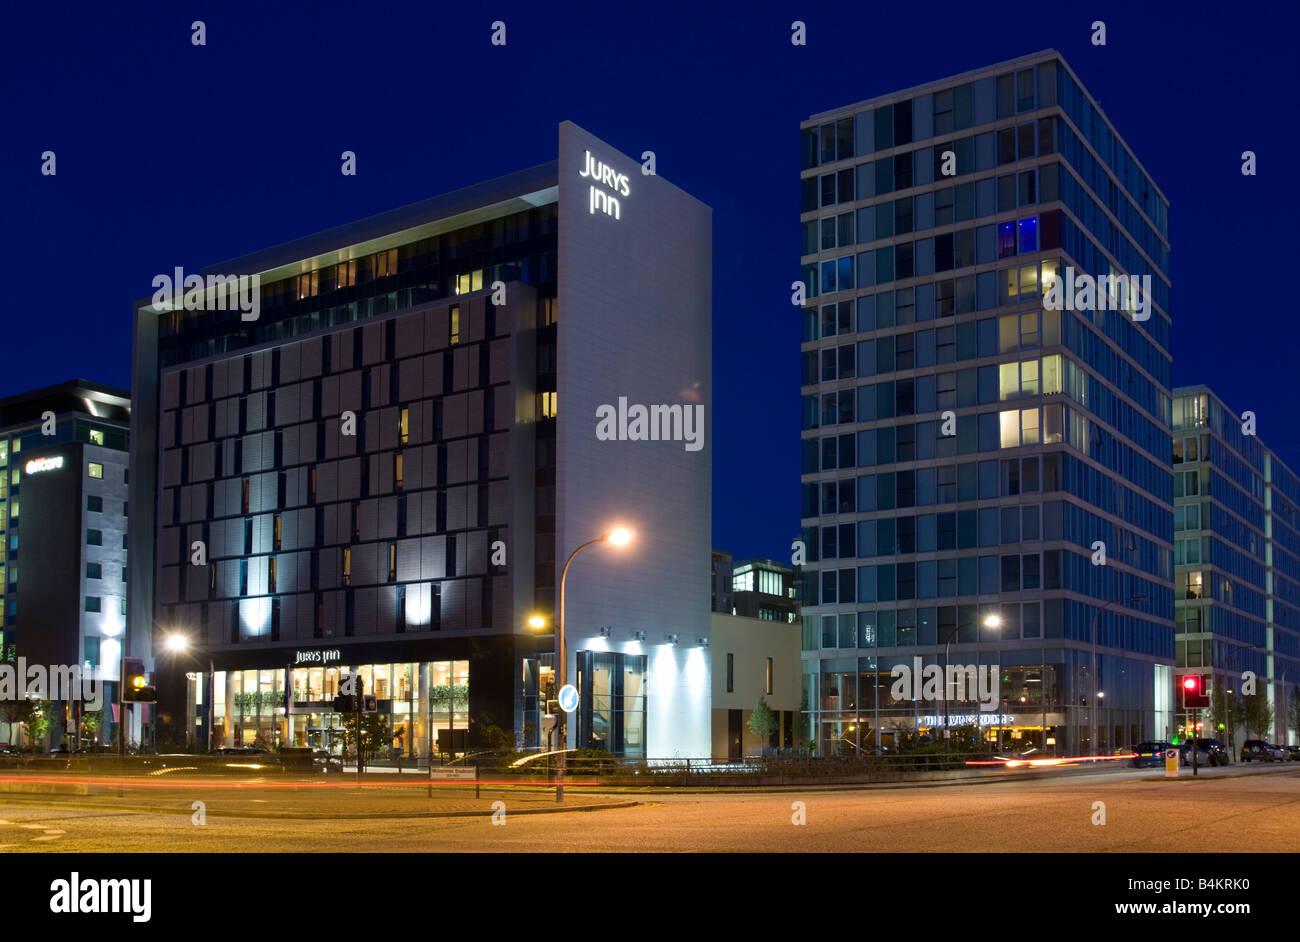 Thehub:mk Mid Rise Apartments And Juryu0027s Inn Hotel Central Milton Keynes  Buckinghamshire